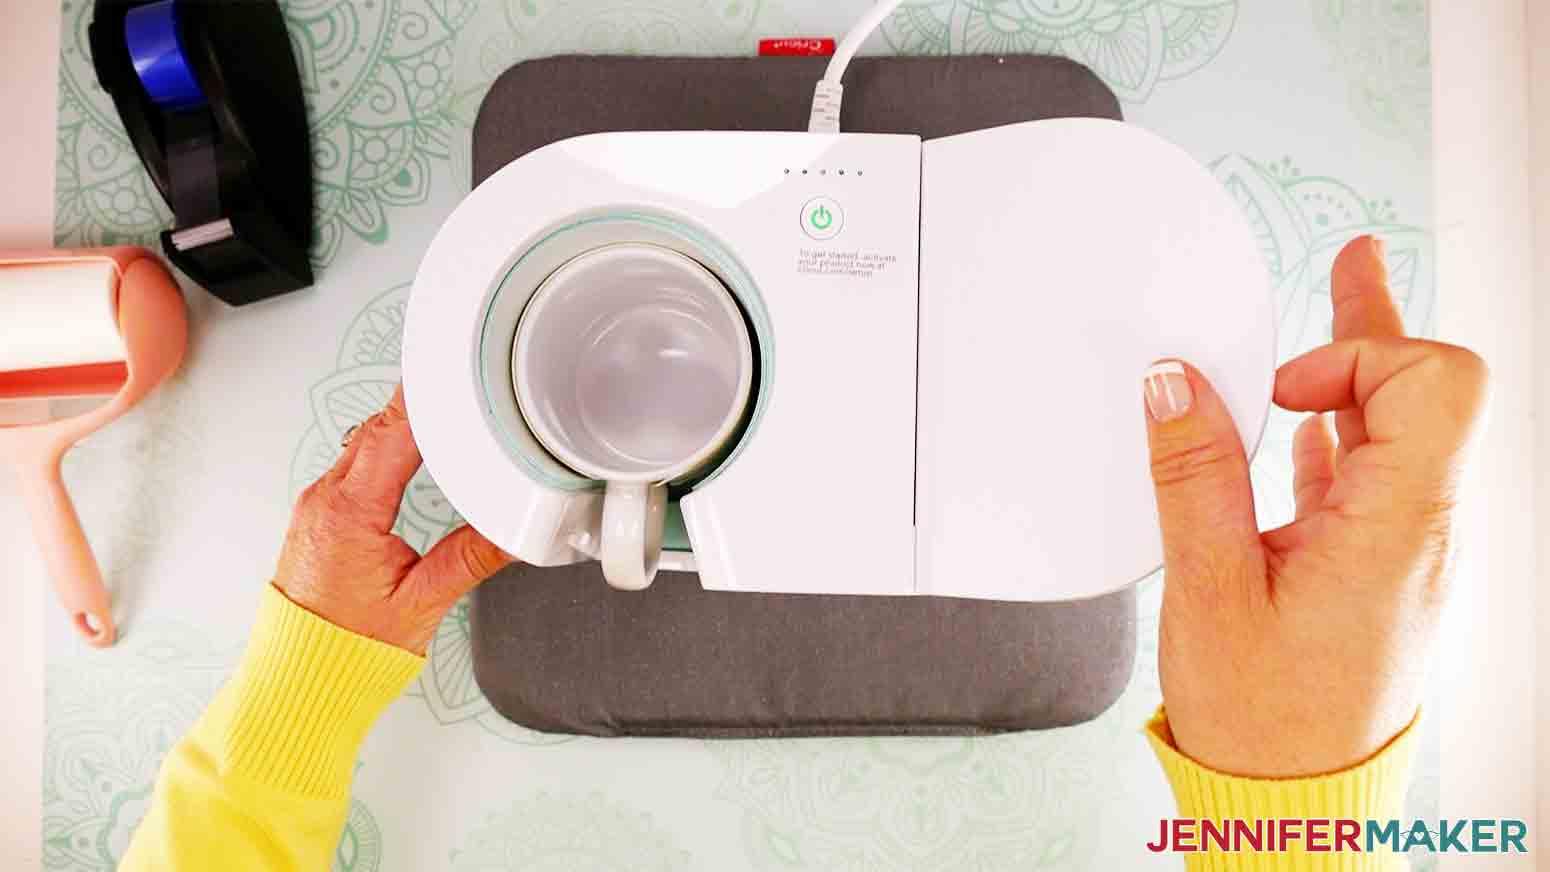 lift lever on cricut heat press to release mug